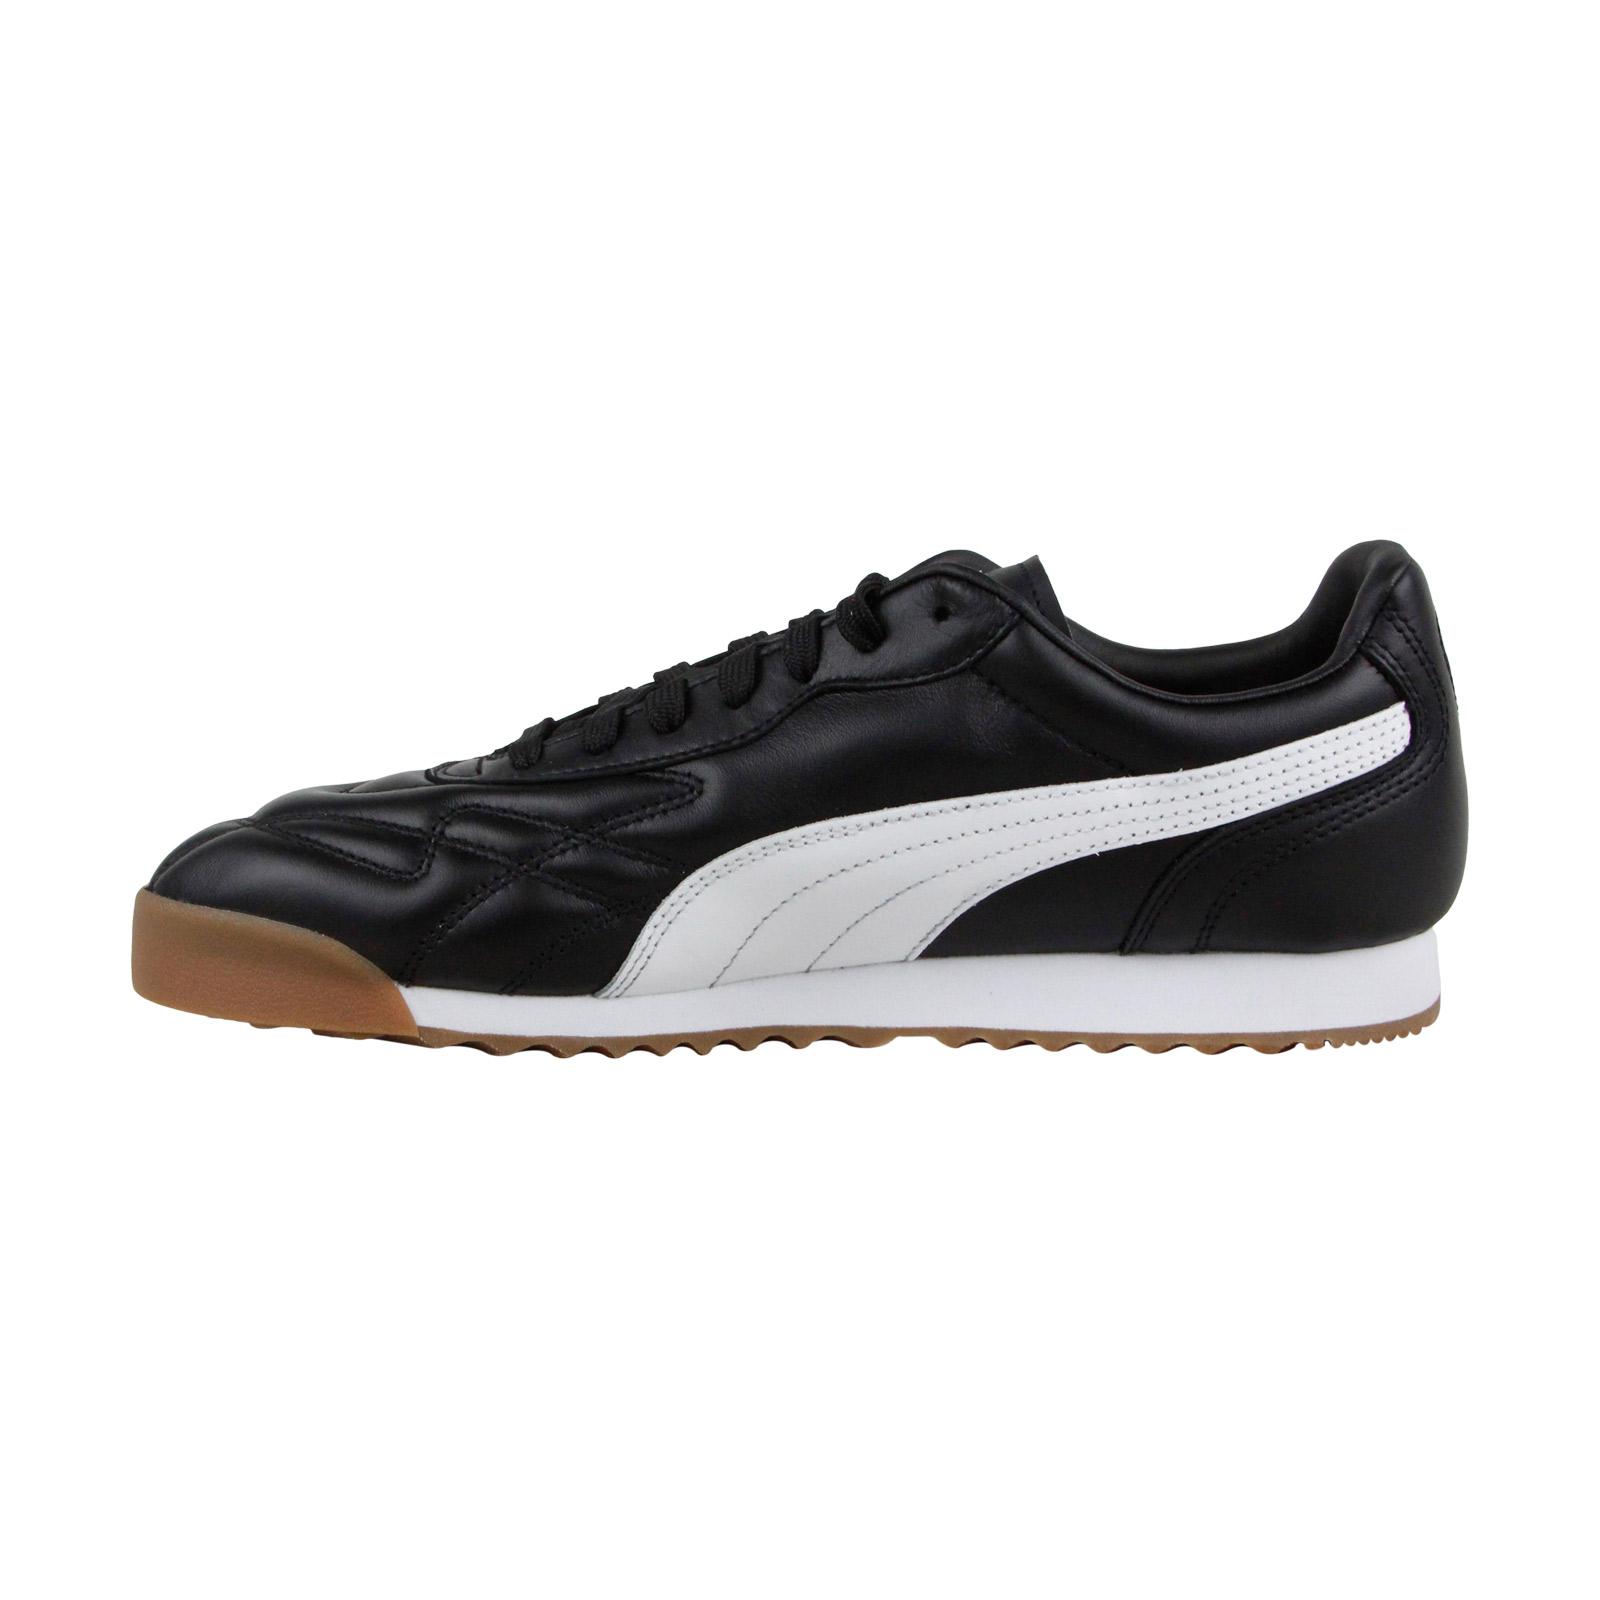 Puma-hommes-Roma-Anniversario-noir-peau-chaussures-de-tennis-40